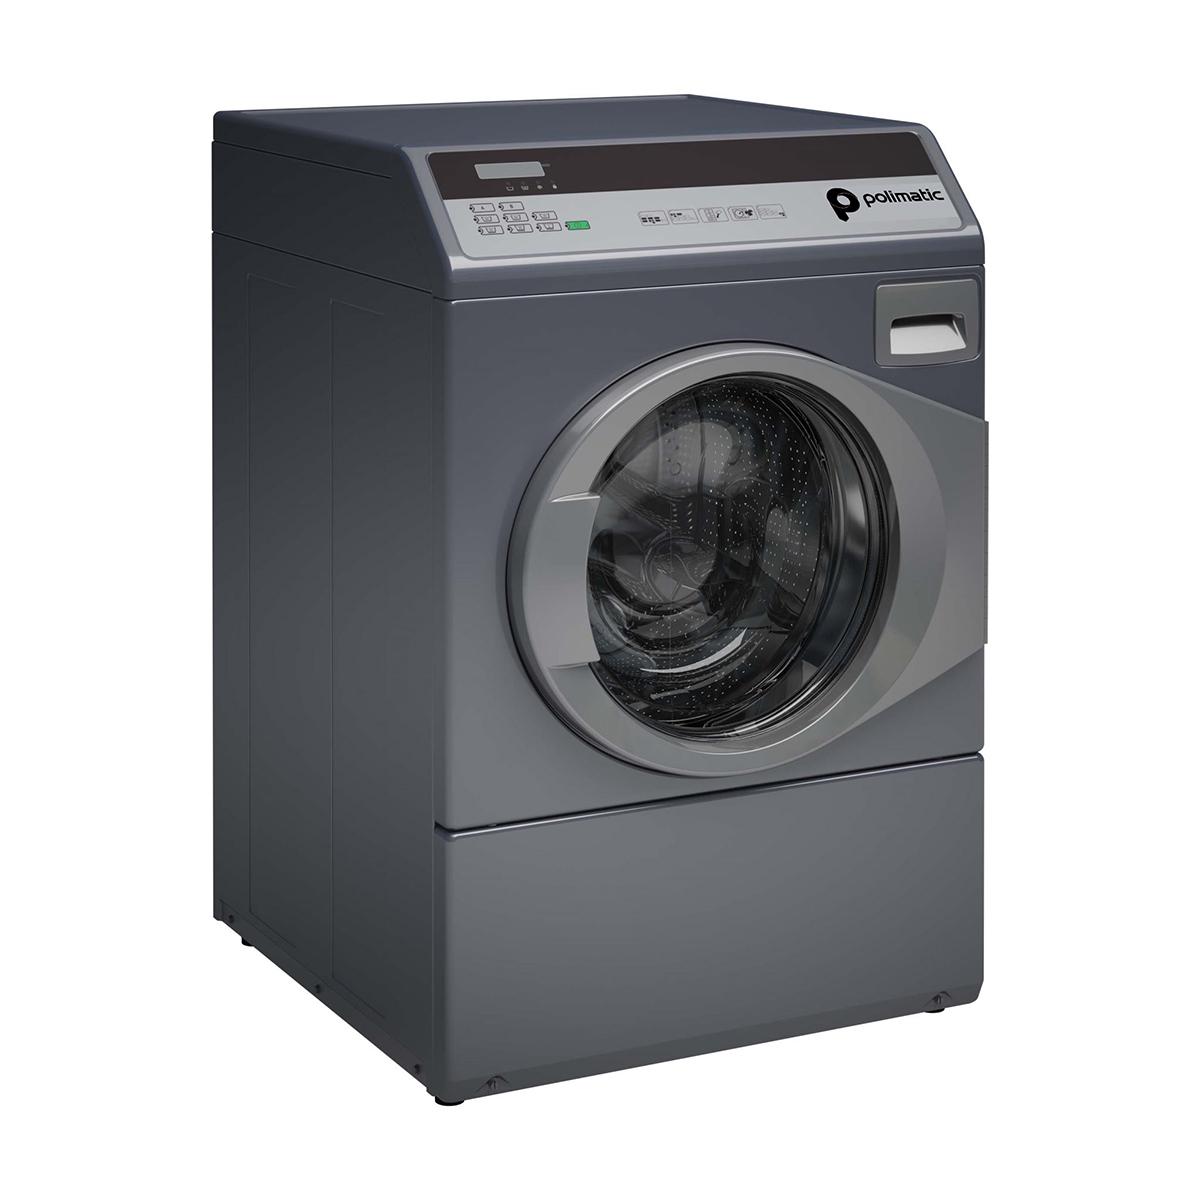 Polimatic lavadora cw 10 for Lavadoras pequenas carga frontal